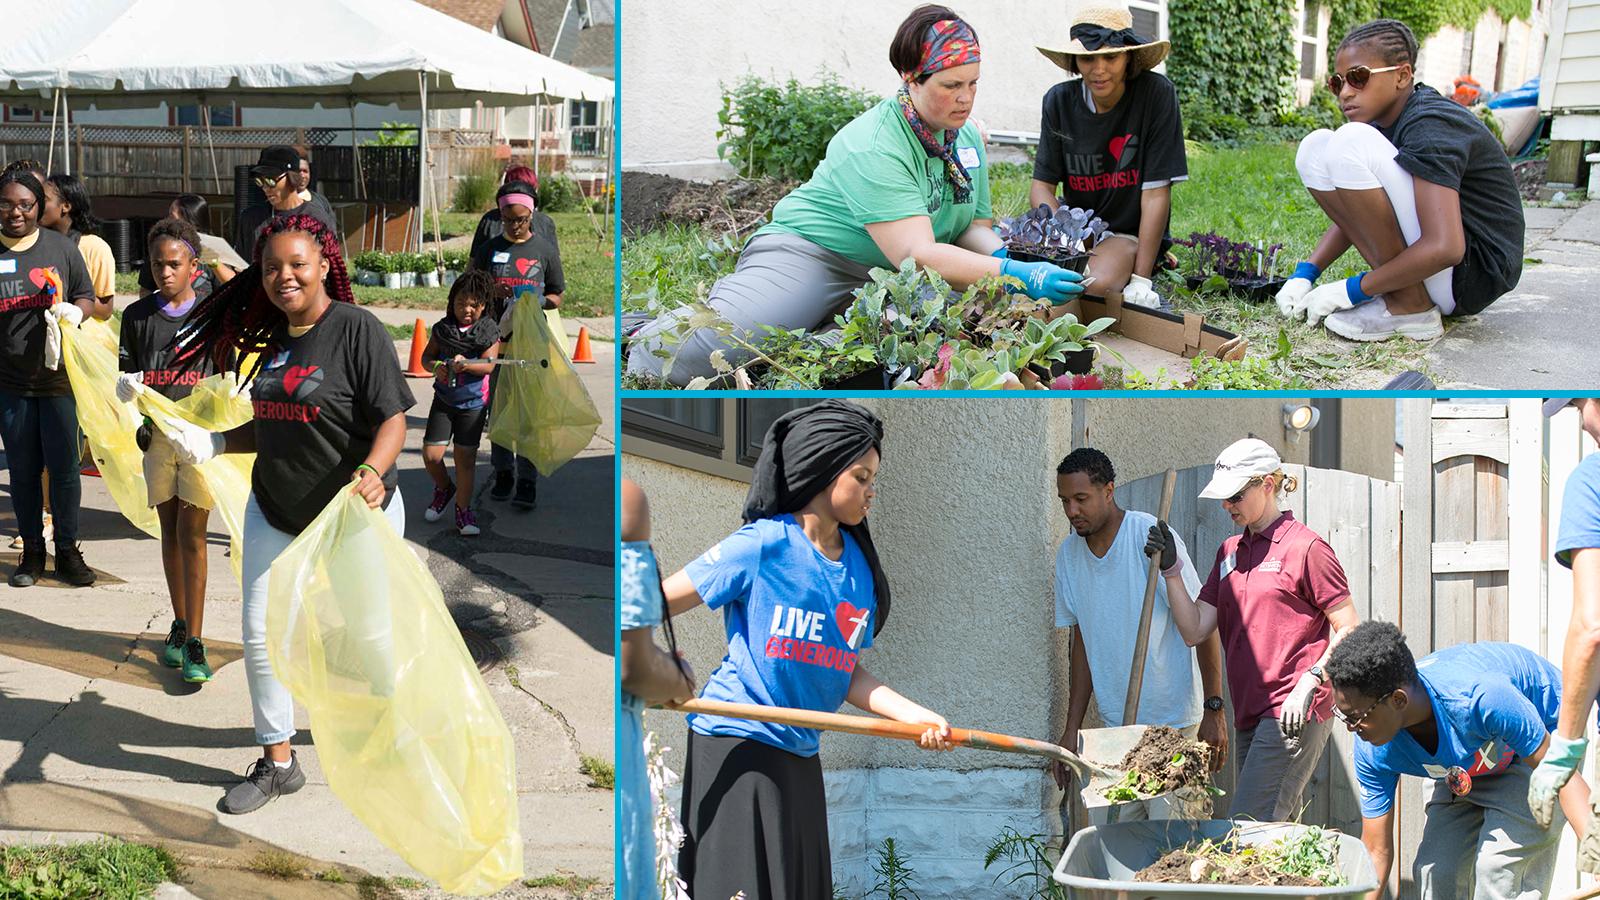 Neighborhood Revitalization event photo collage